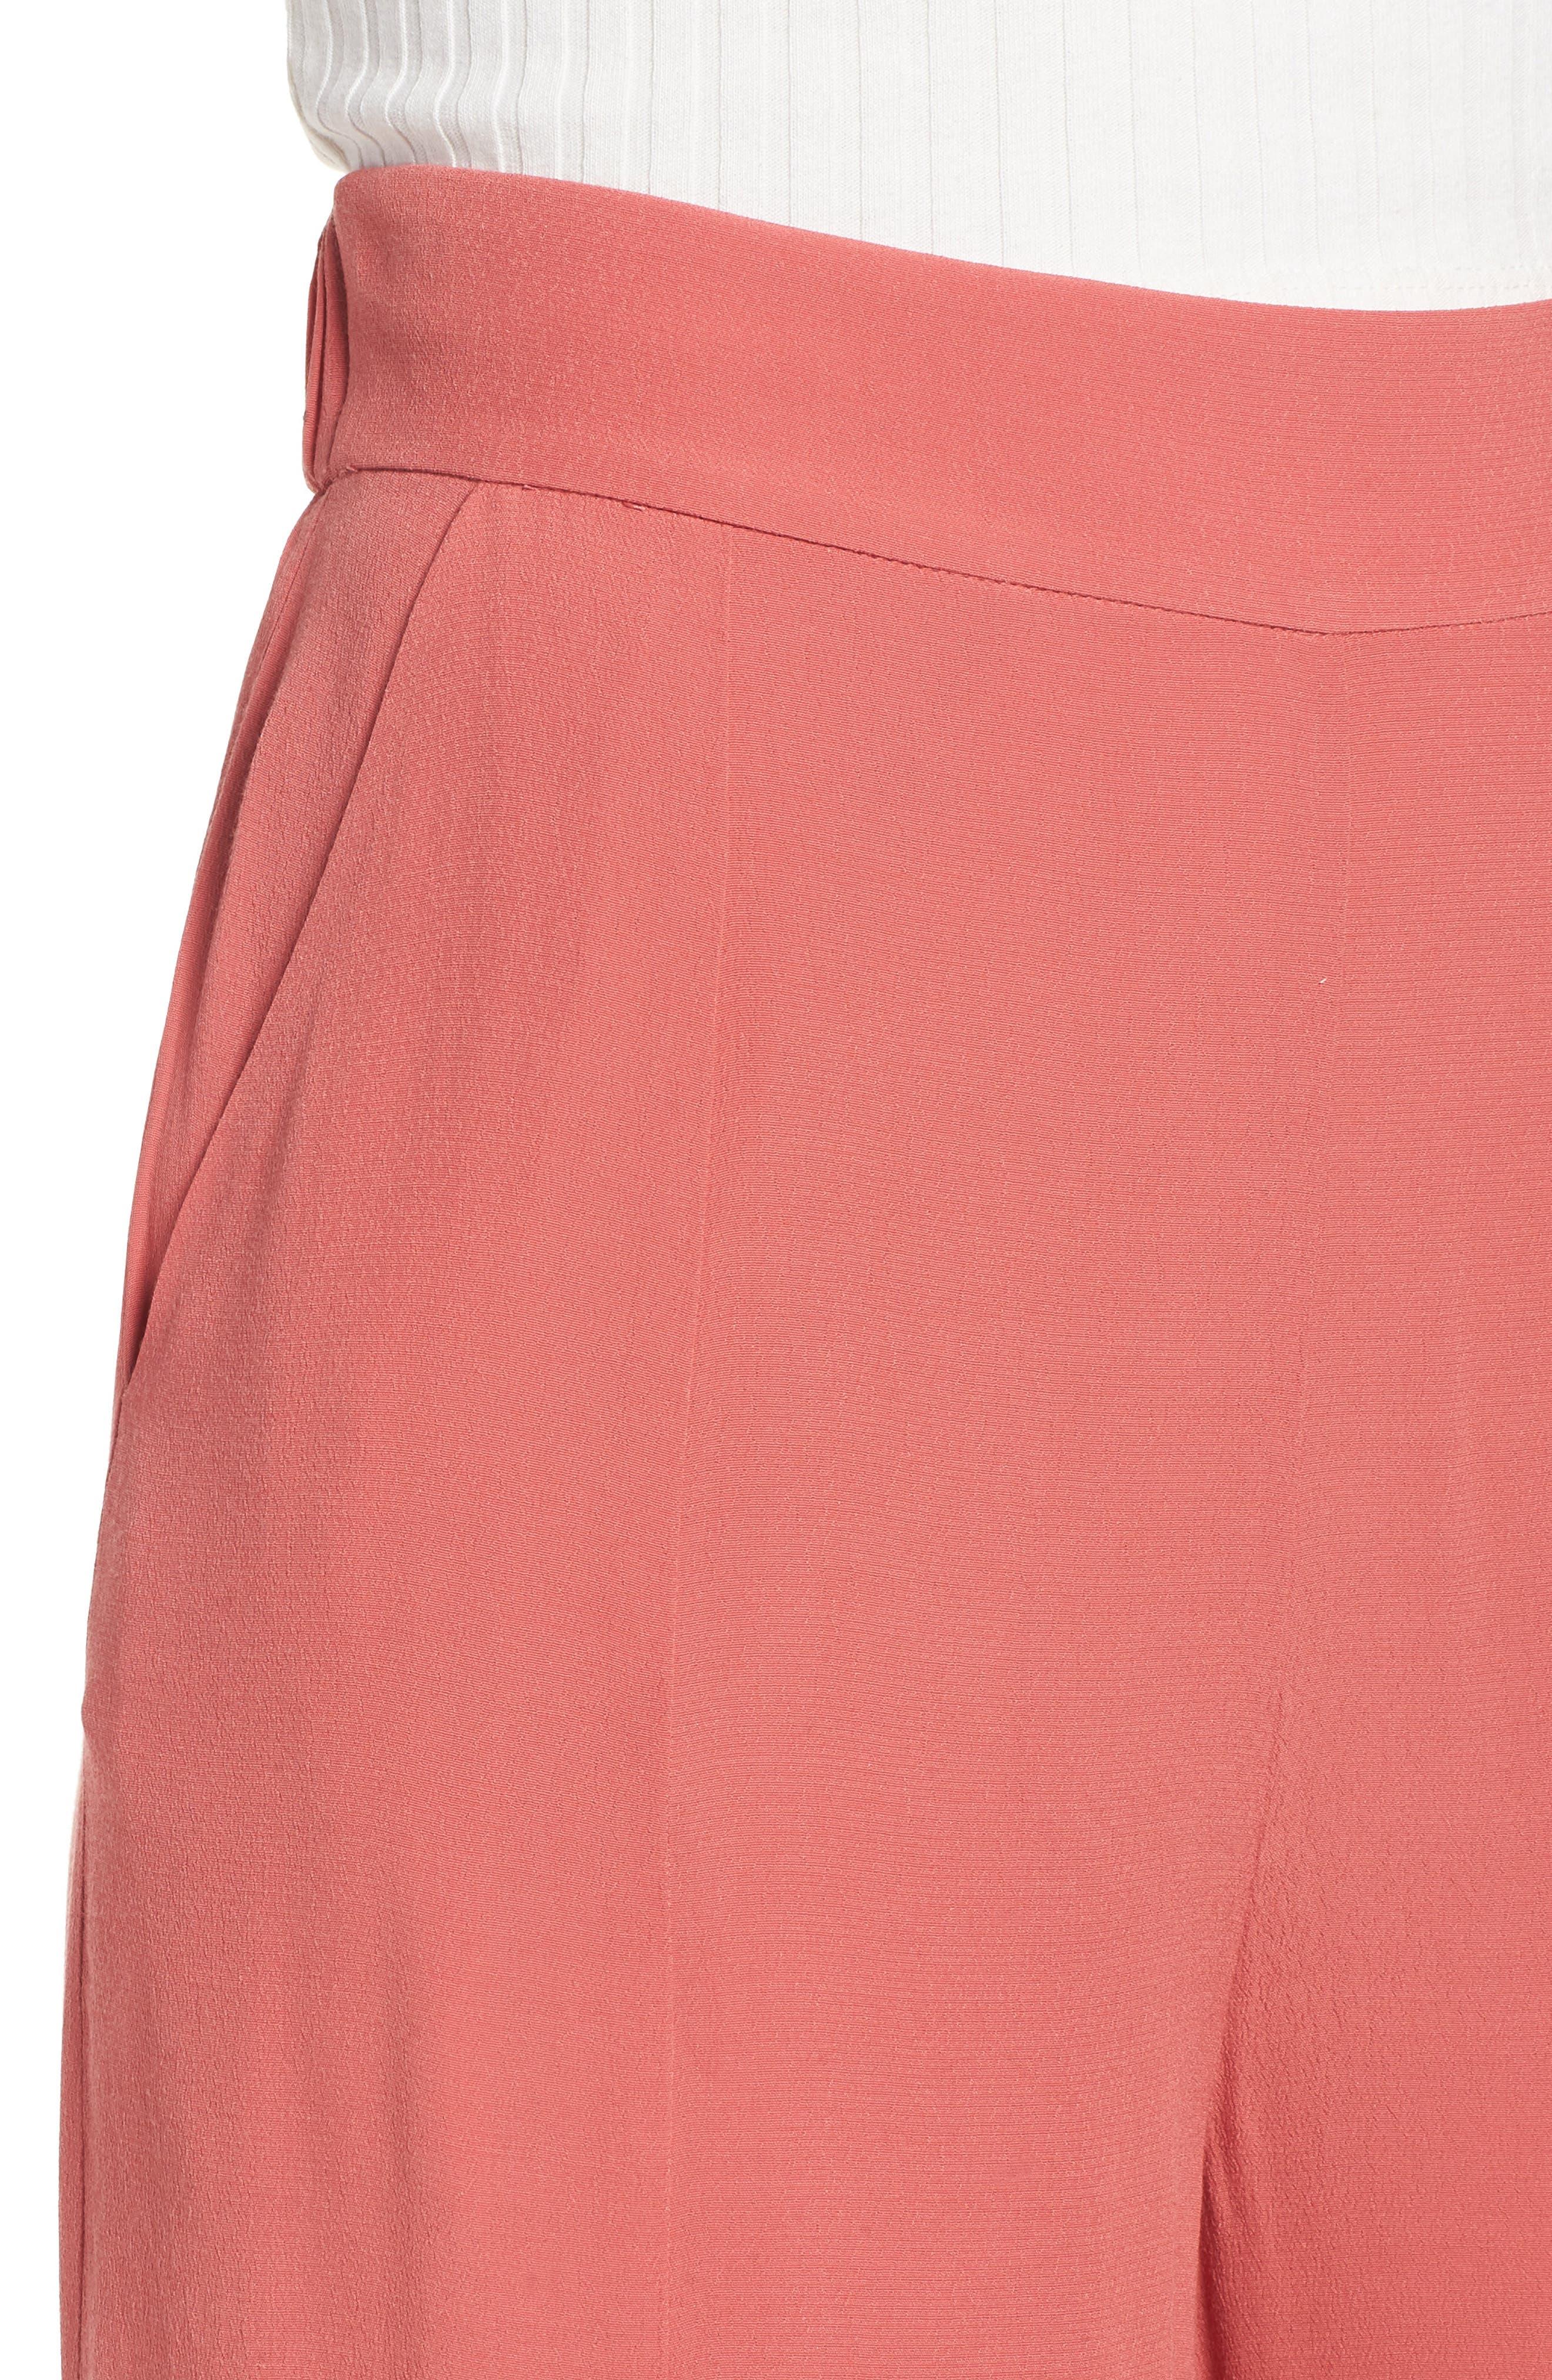 High Waist Crop Wide Leg Pants,                             Alternate thumbnail 4, color,                             Coral Faded